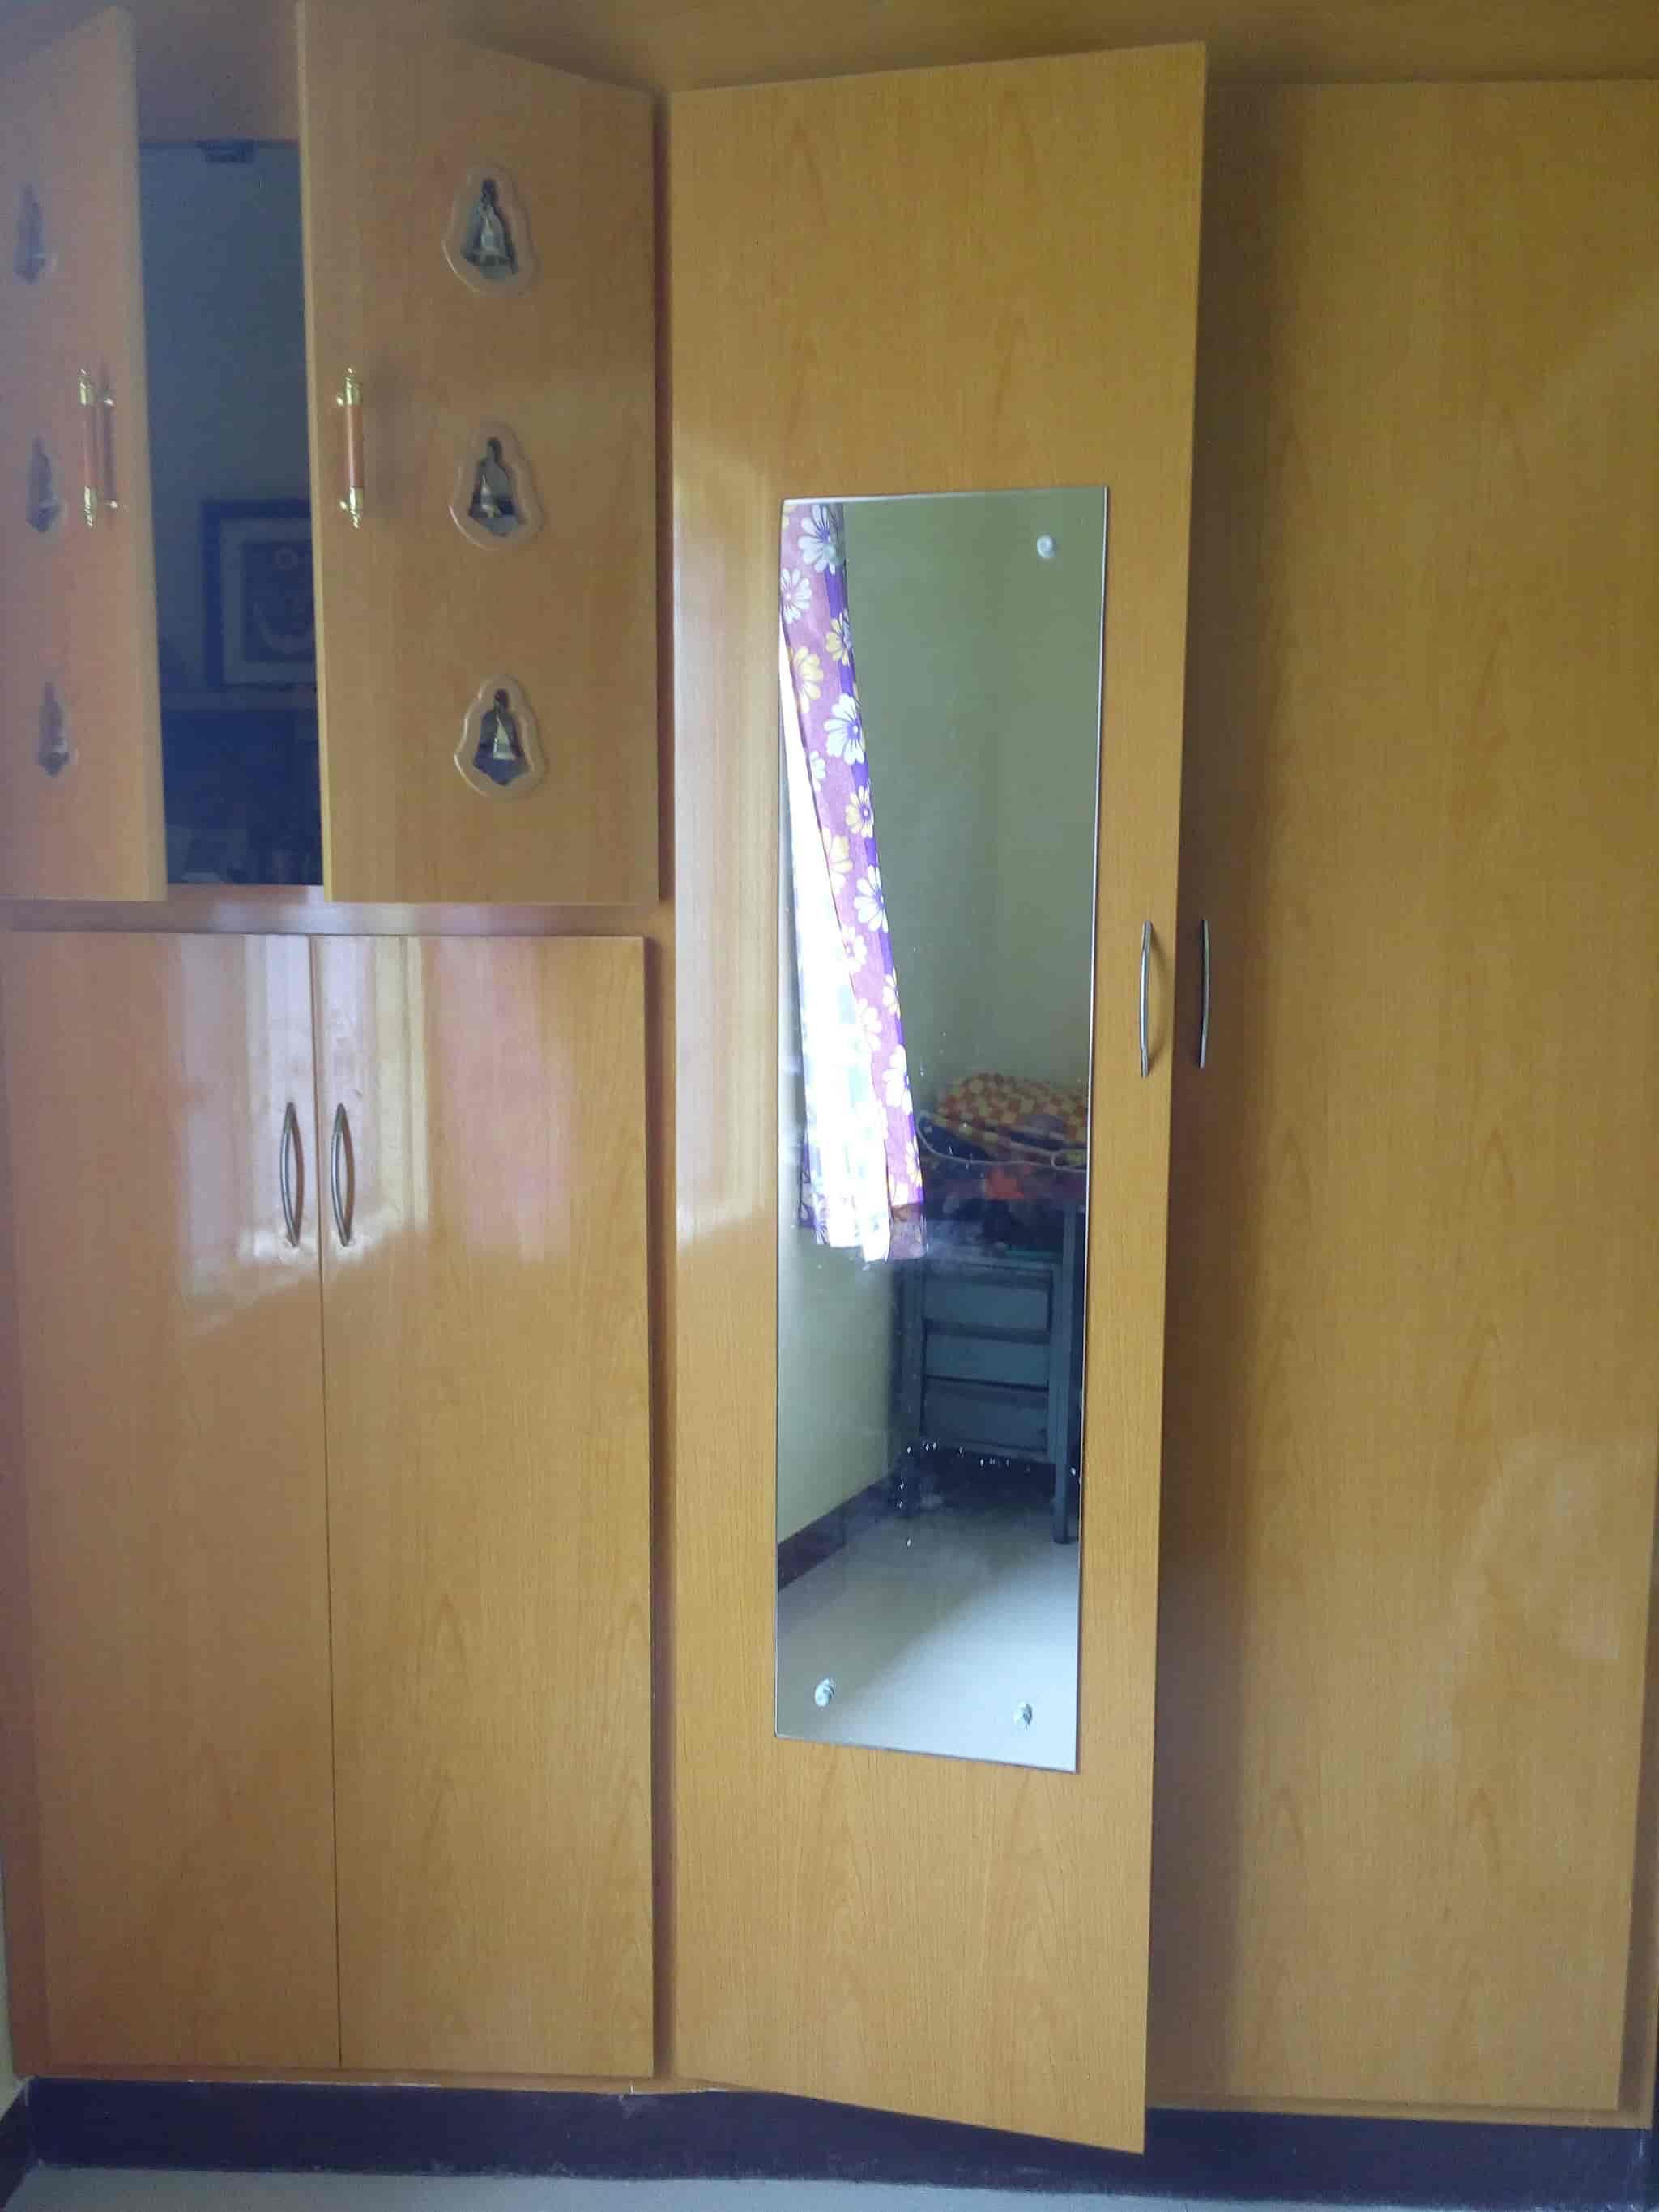 M K Pvc Doors Saravan&atti - PVC Door Dealers in Coimbatore - Justdial & M K Pvc Doors Saravanampatti - PVC Door Dealers in Coimbatore ...